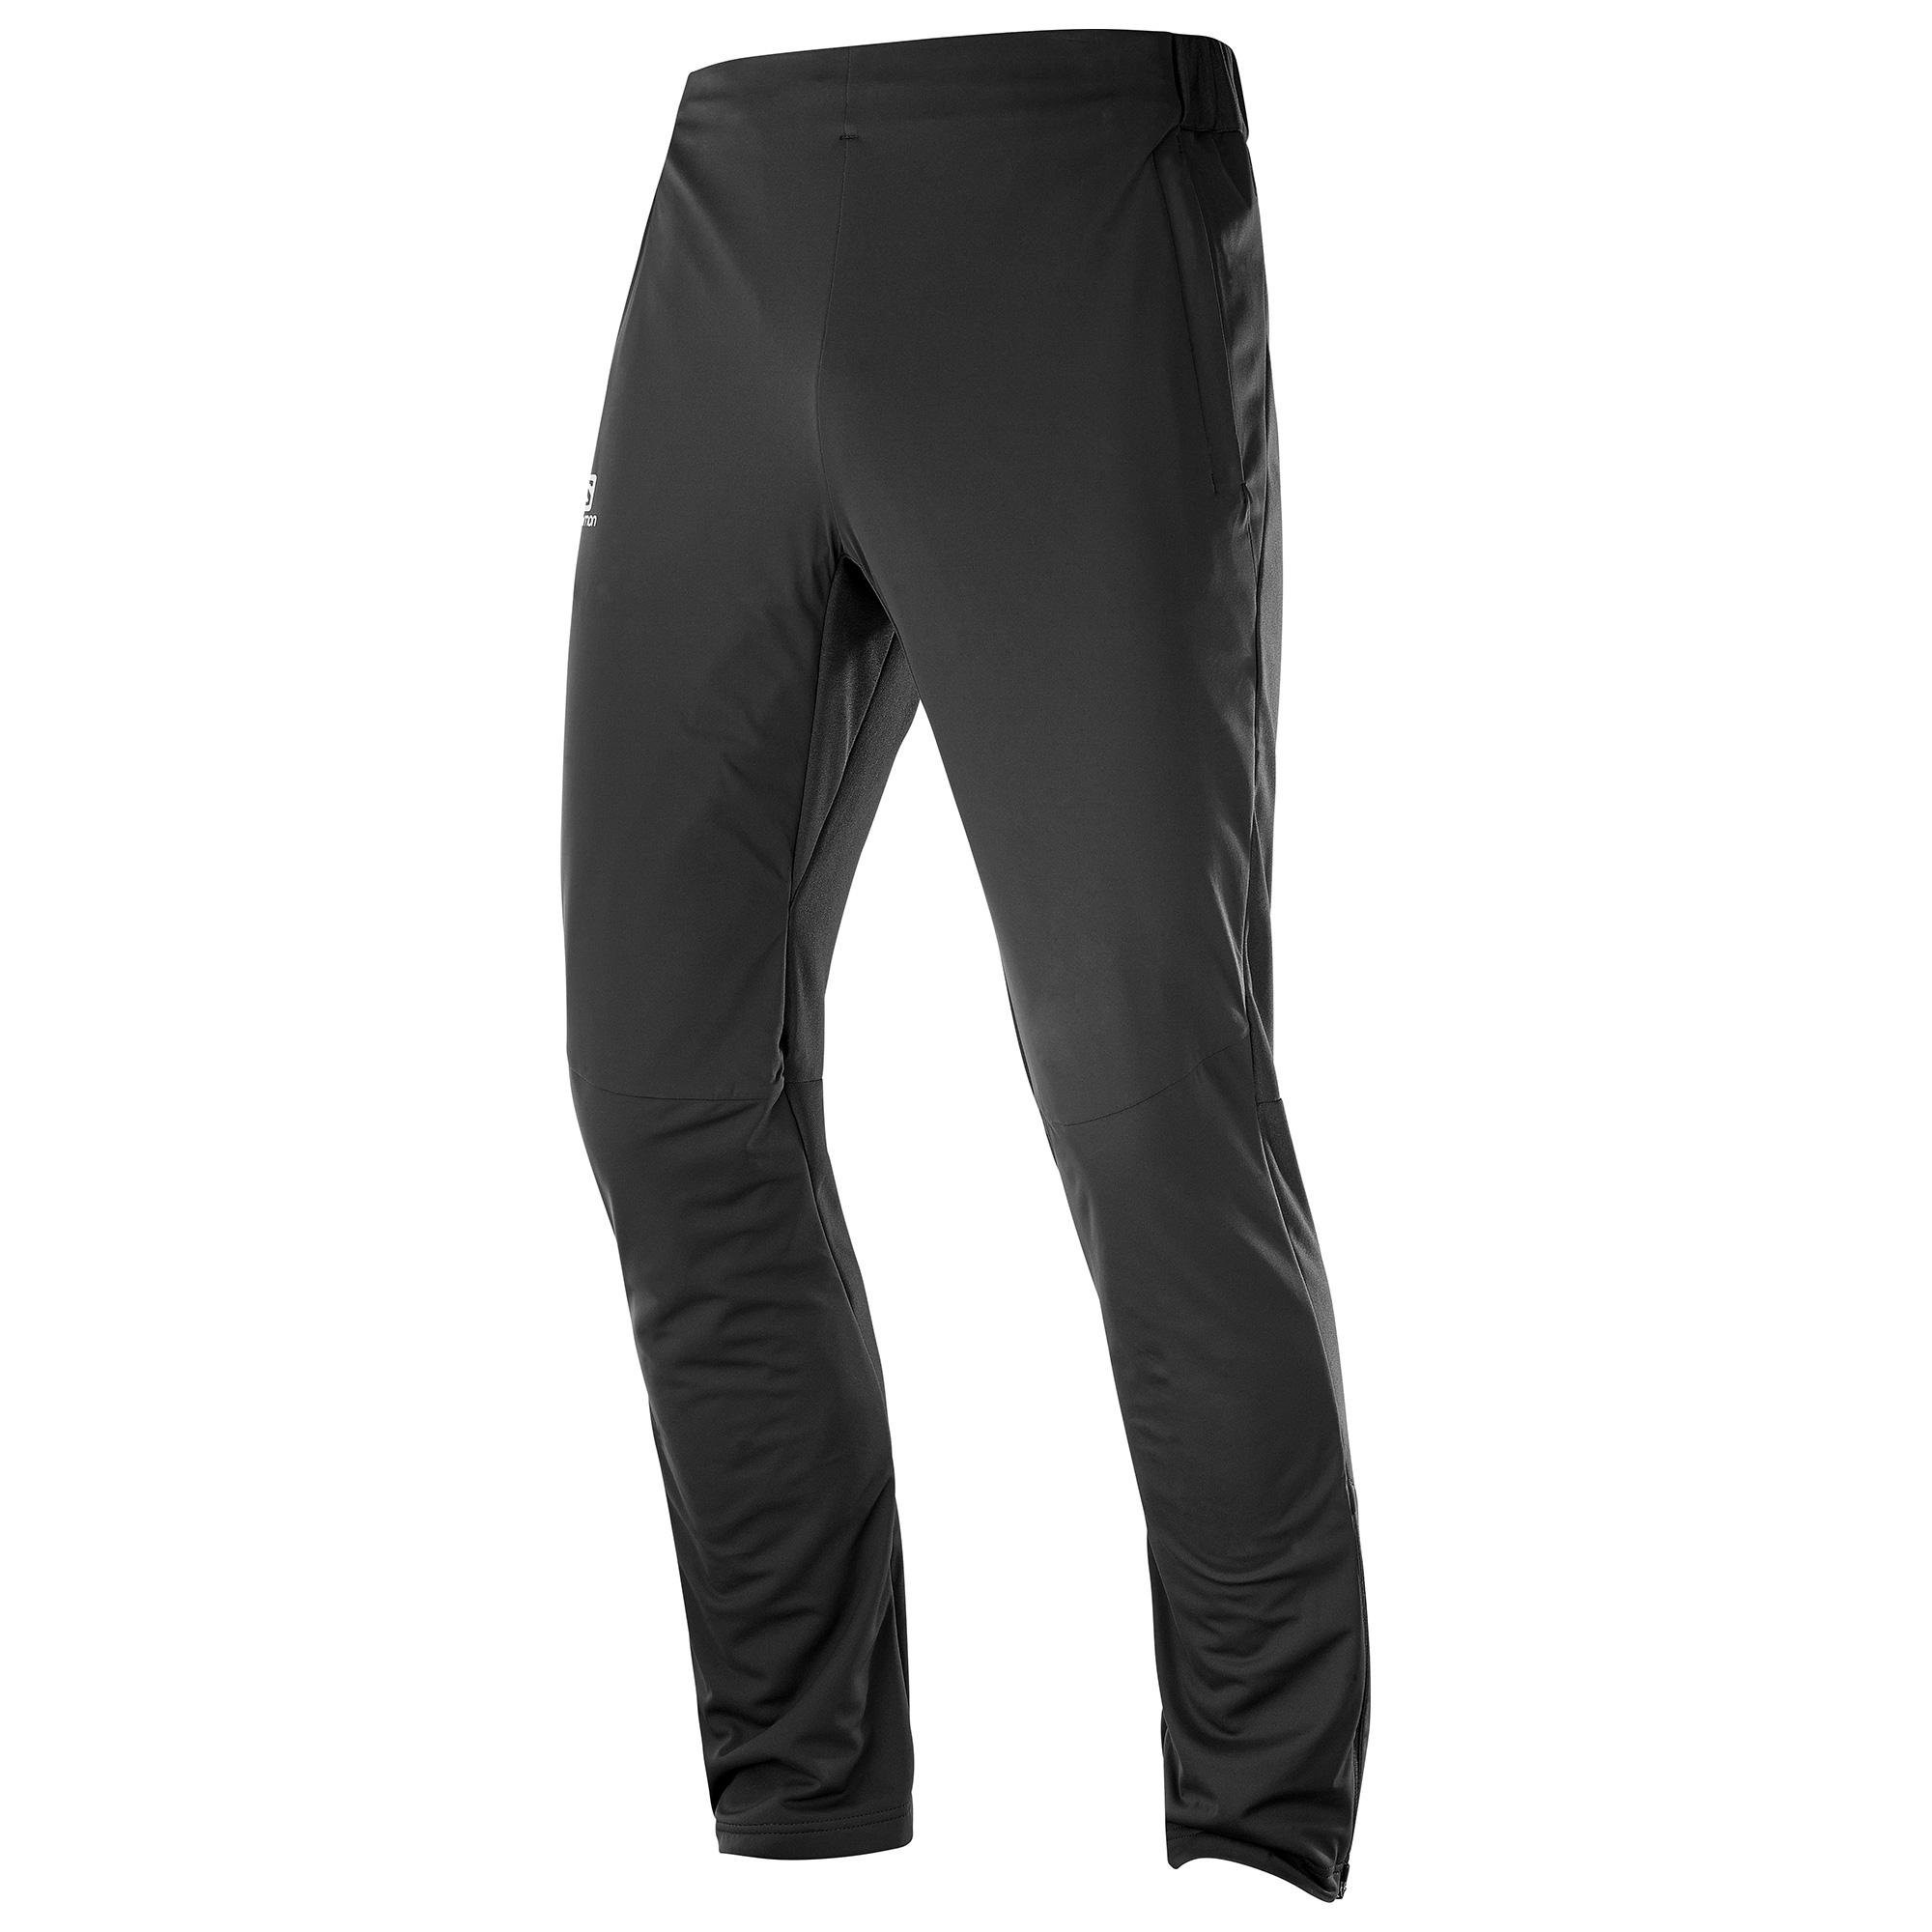 Salomon Agile Warm Pant Men's